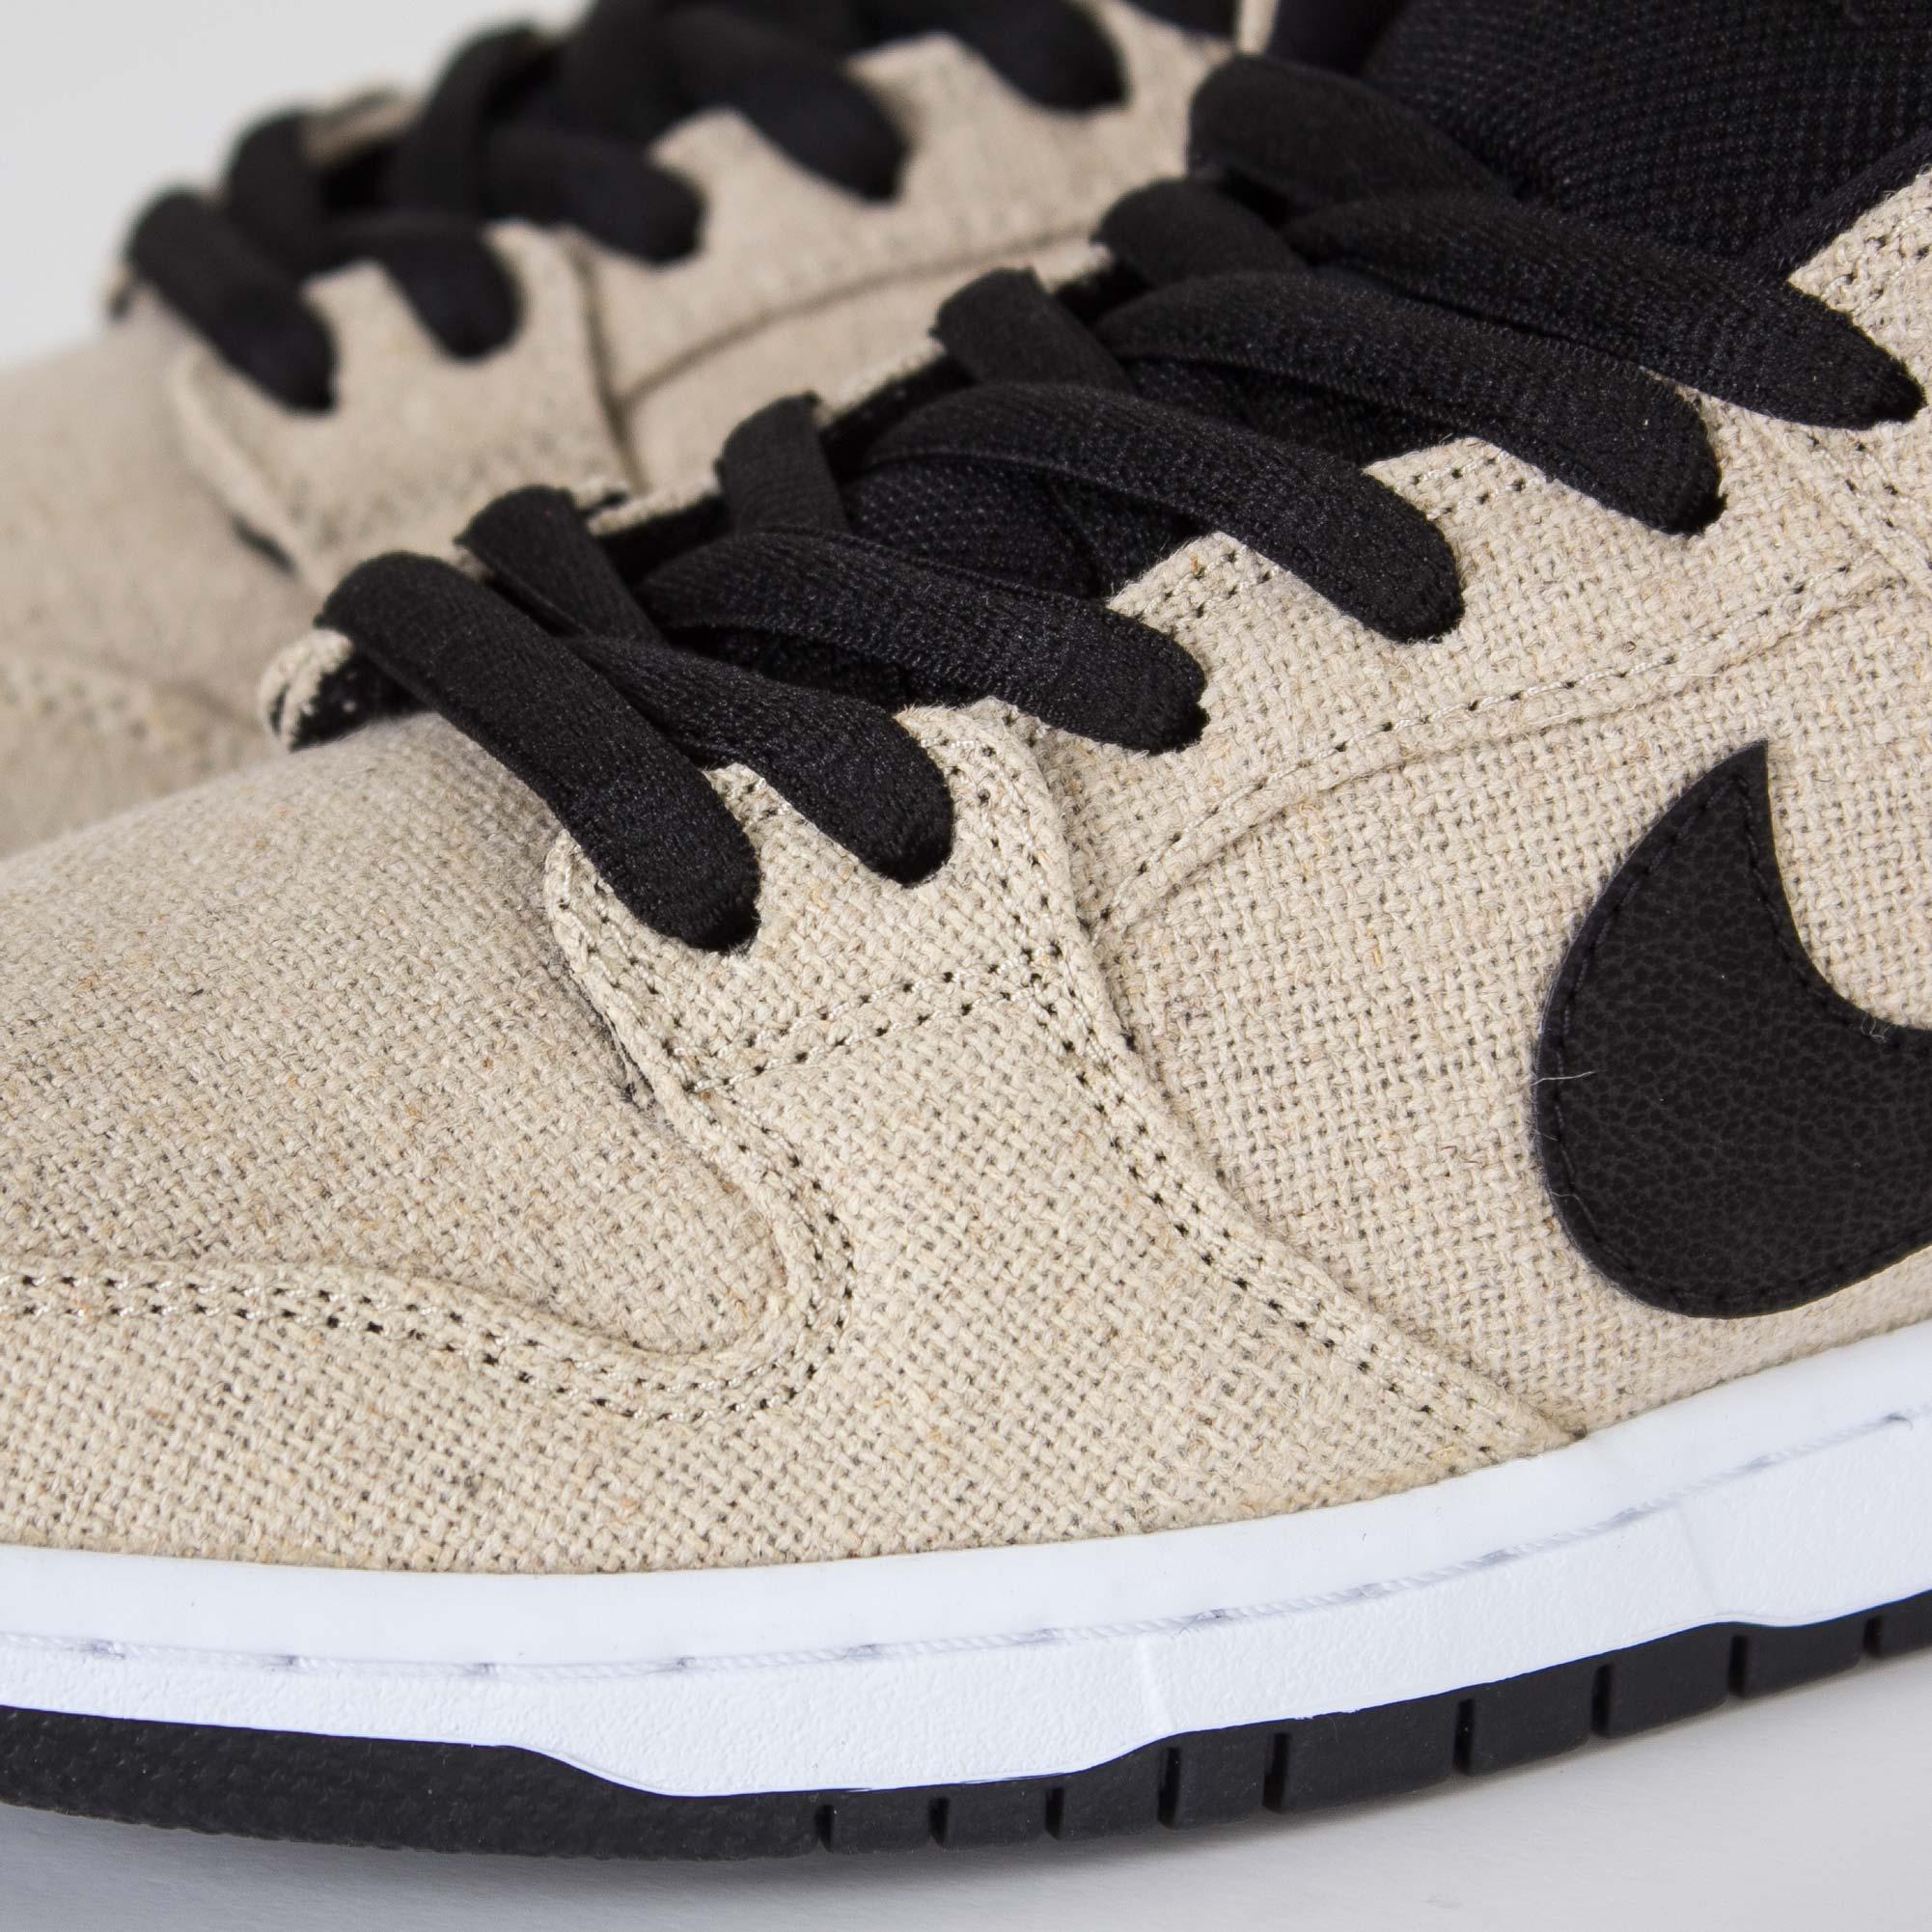 39127ee07898 Nike Dunk Low Premium SB - 313170-206 - Sneakersnstuff